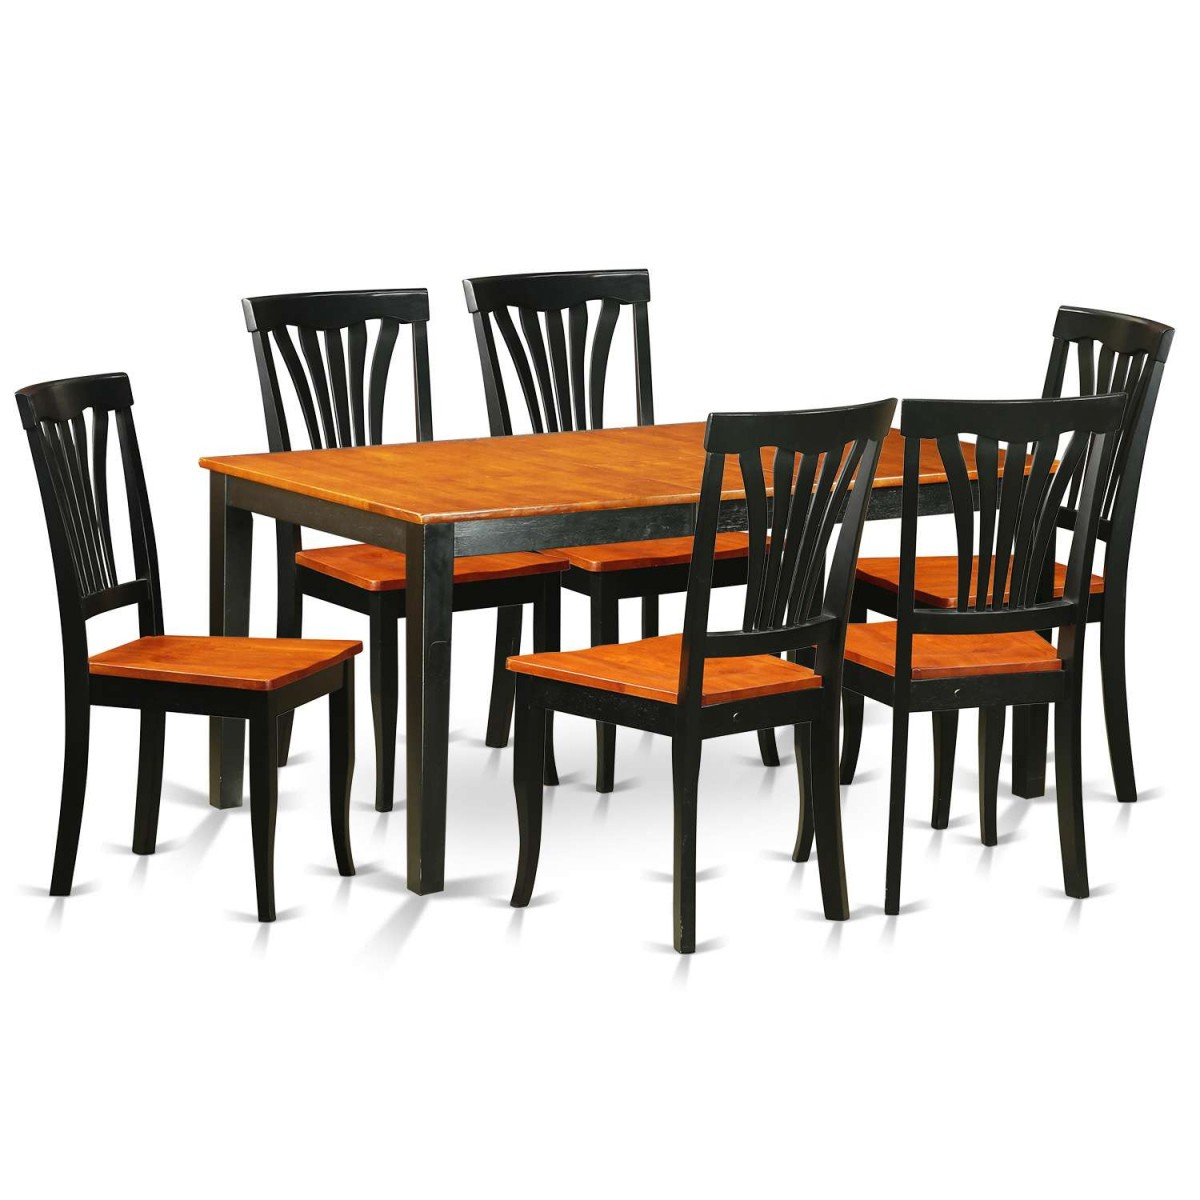 East West Nicoli 6 Piece Dining Set: East West Furniture Nicoli 7 Piece Kitchen Table Set